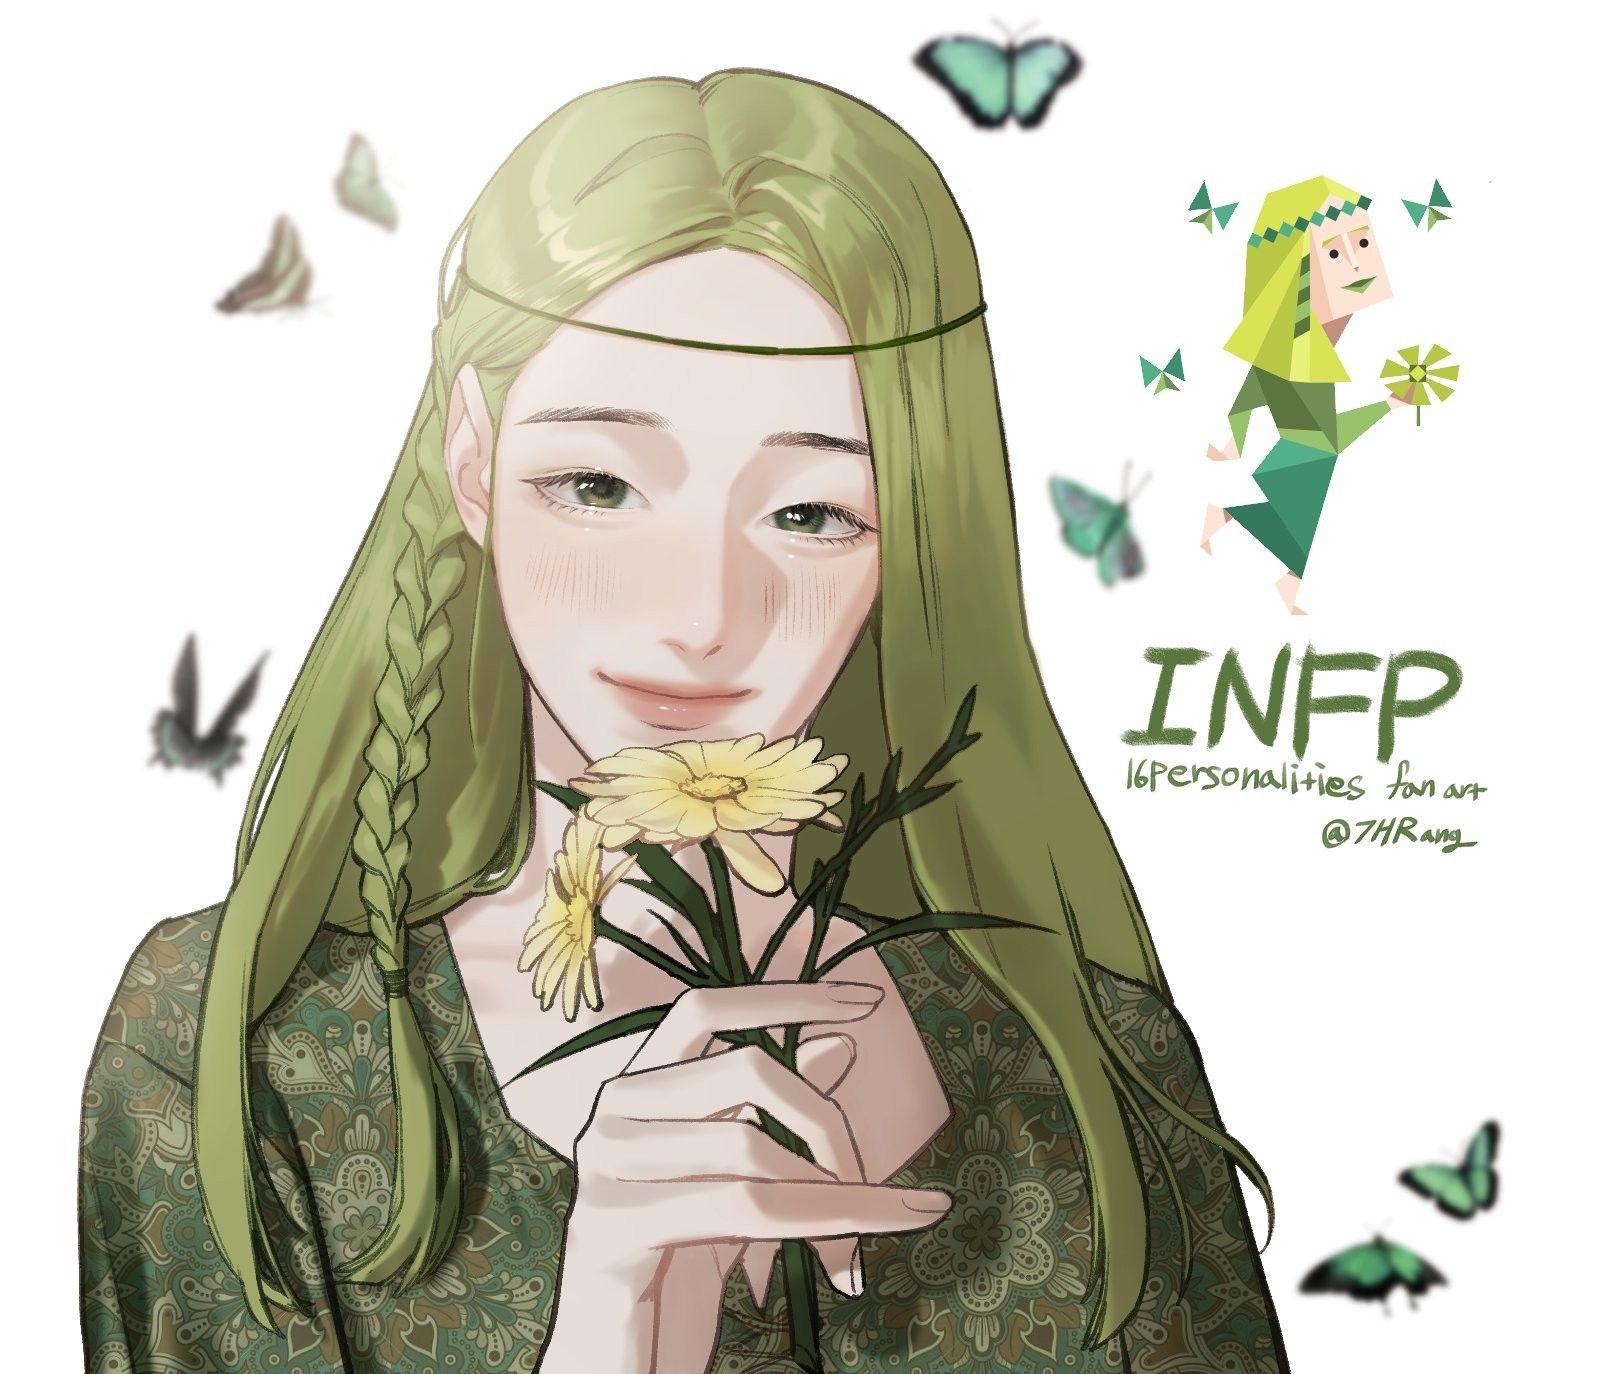 INFP Fanart ~ 7HRang